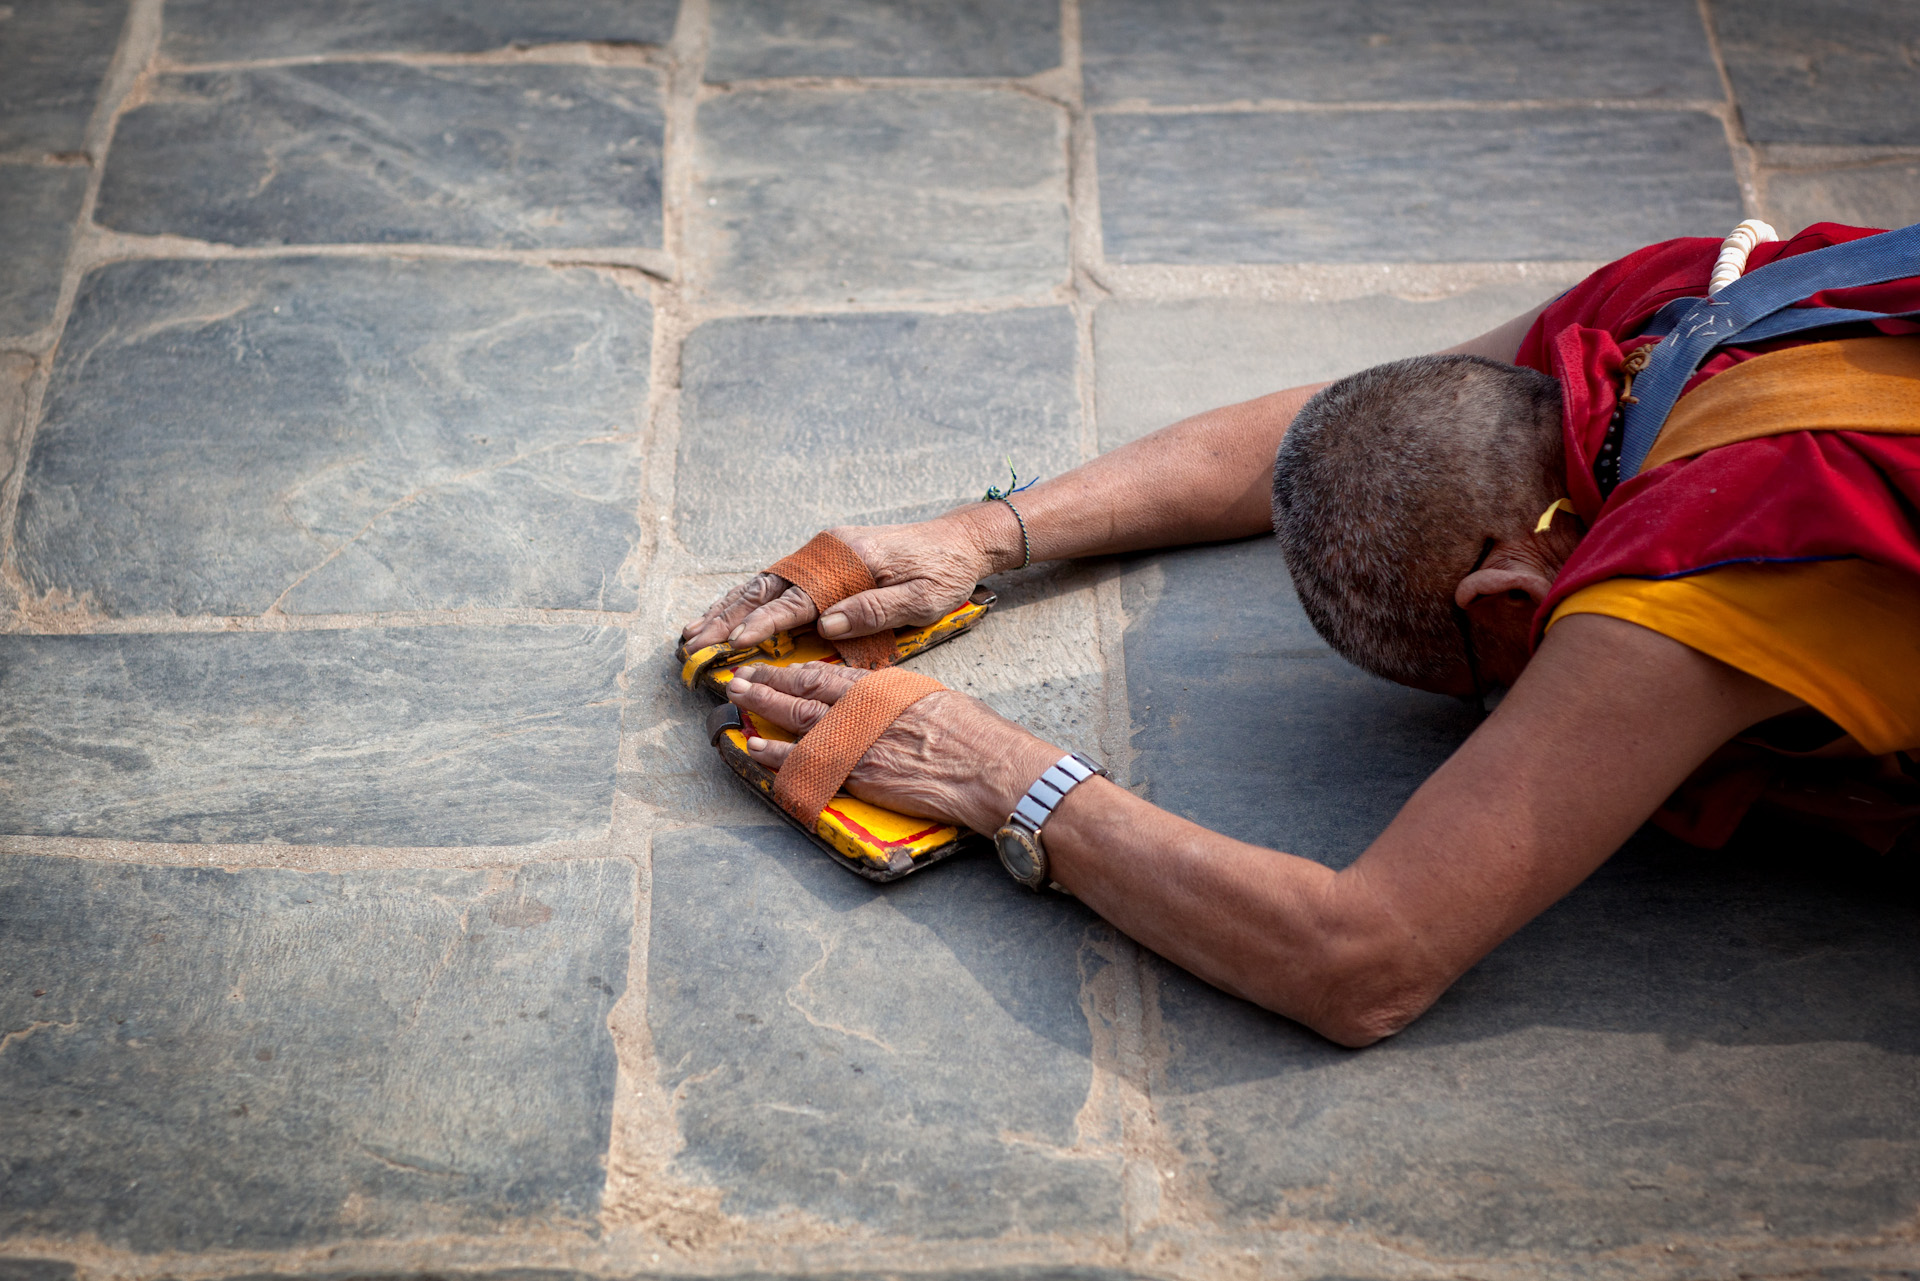 Nepal-Kathmandu-Travel-Boudhanath-Buddhism-Tibetan_2.JPG